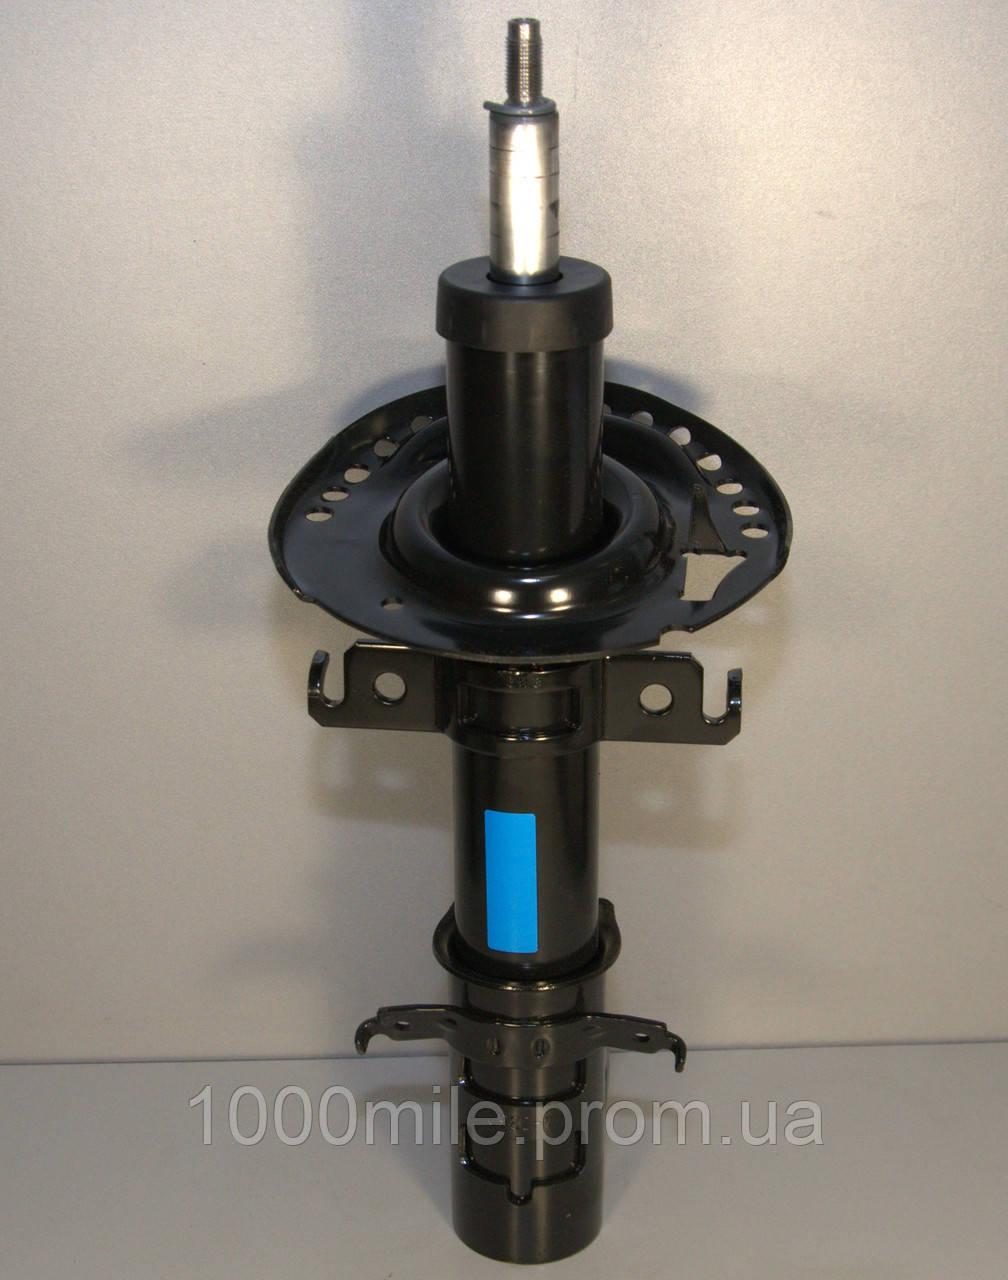 Амортизатор передний (R15) на Renault Kangoo II 2008-> — Renault - 8200868516